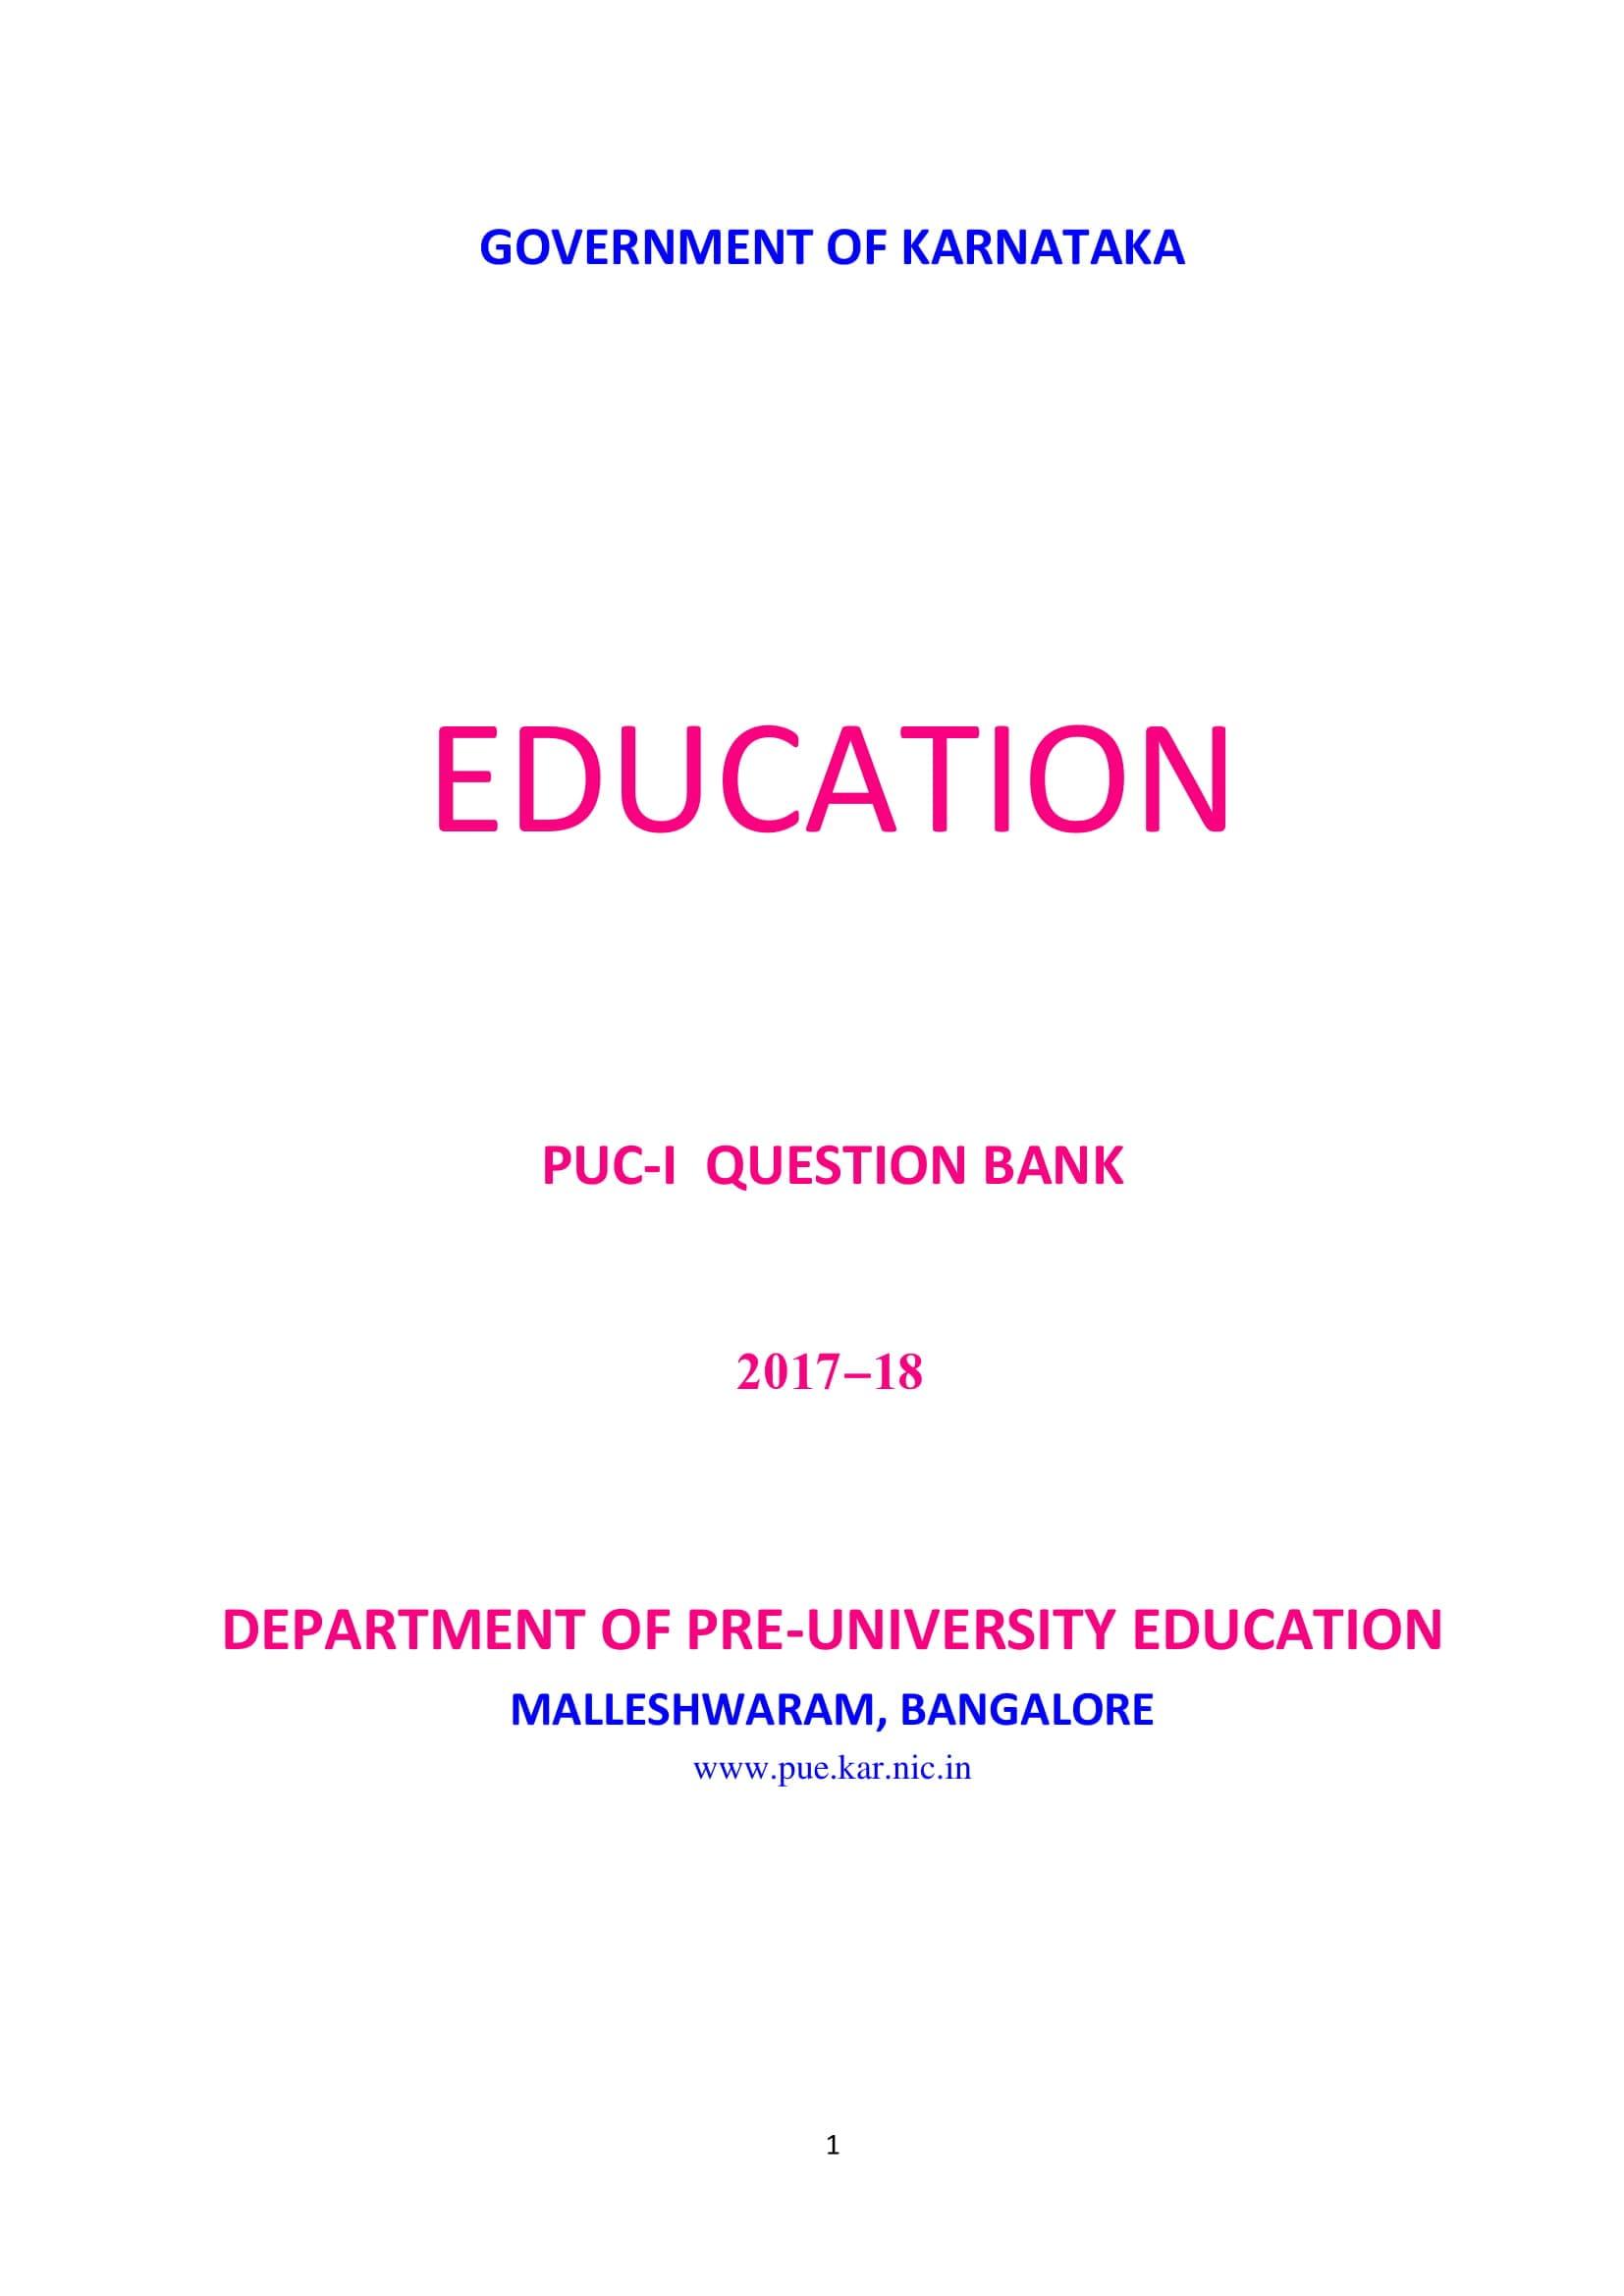 Karnataka 1st PUC Question Bank for Education 2017-18 - Page 1